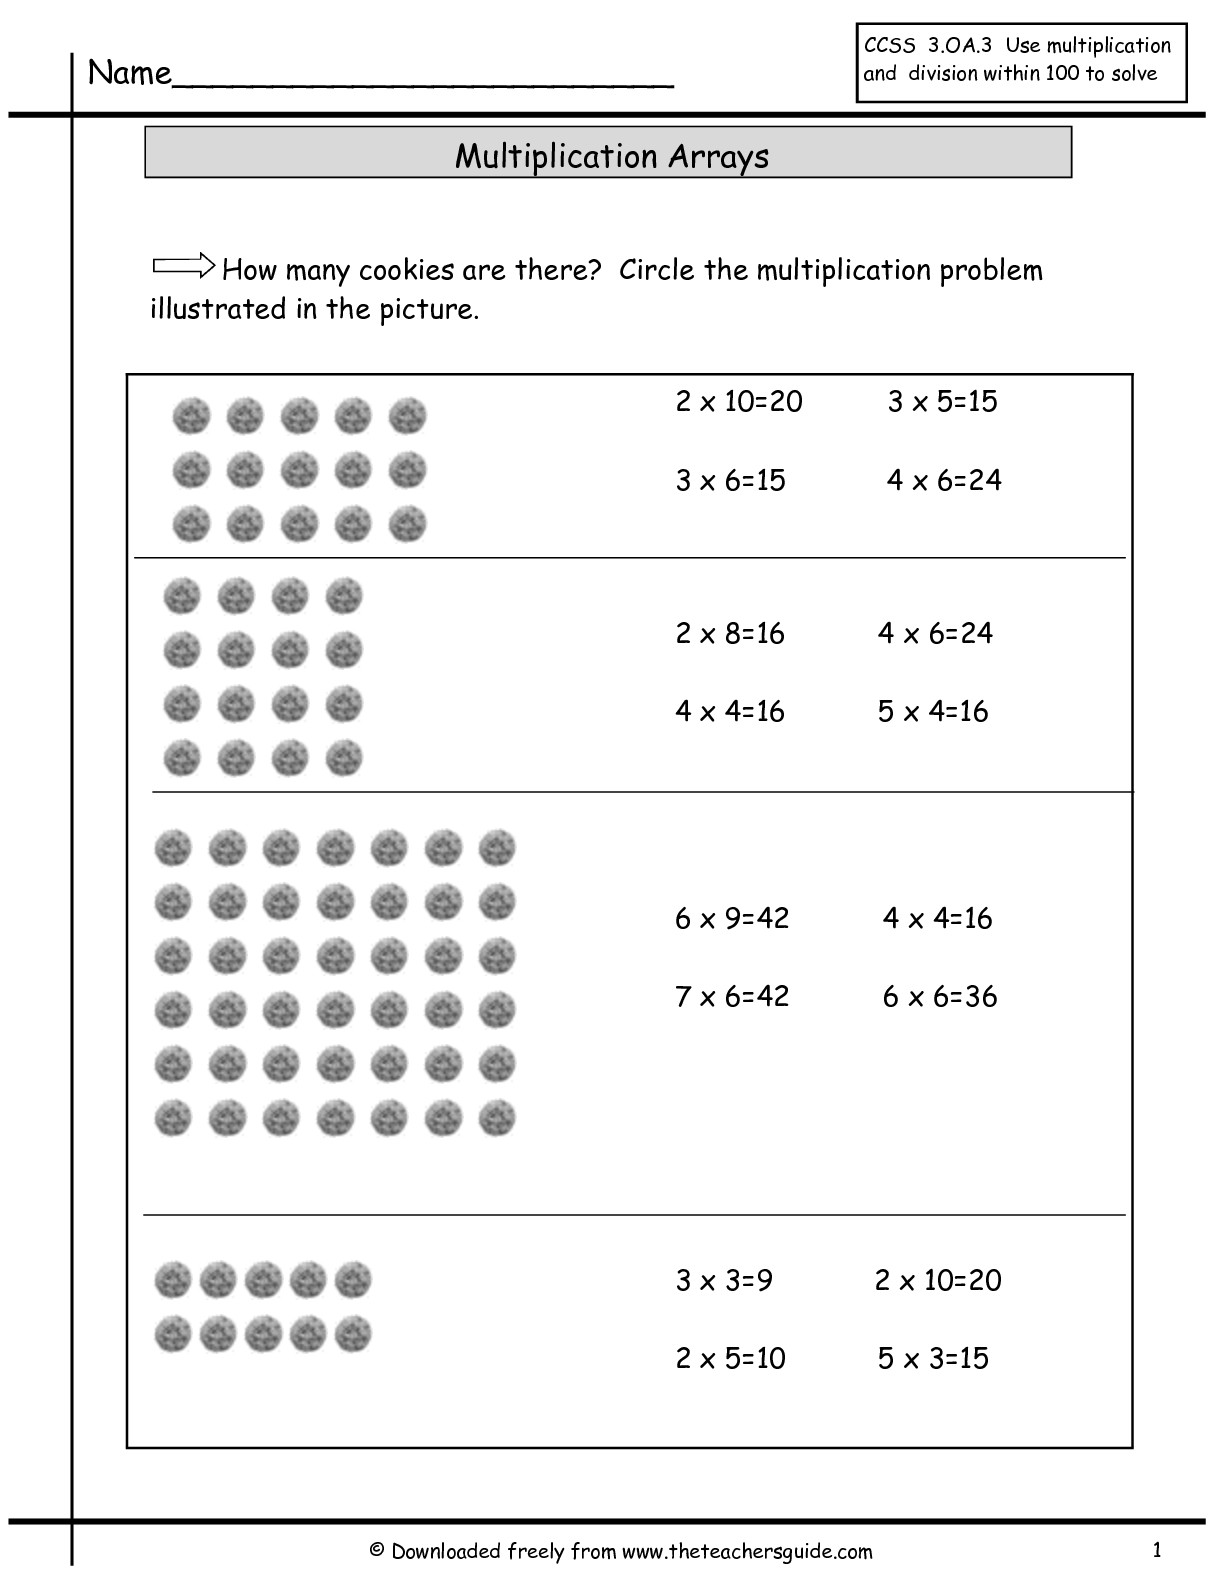 Multiplication Worksheets Using Arrays 920908